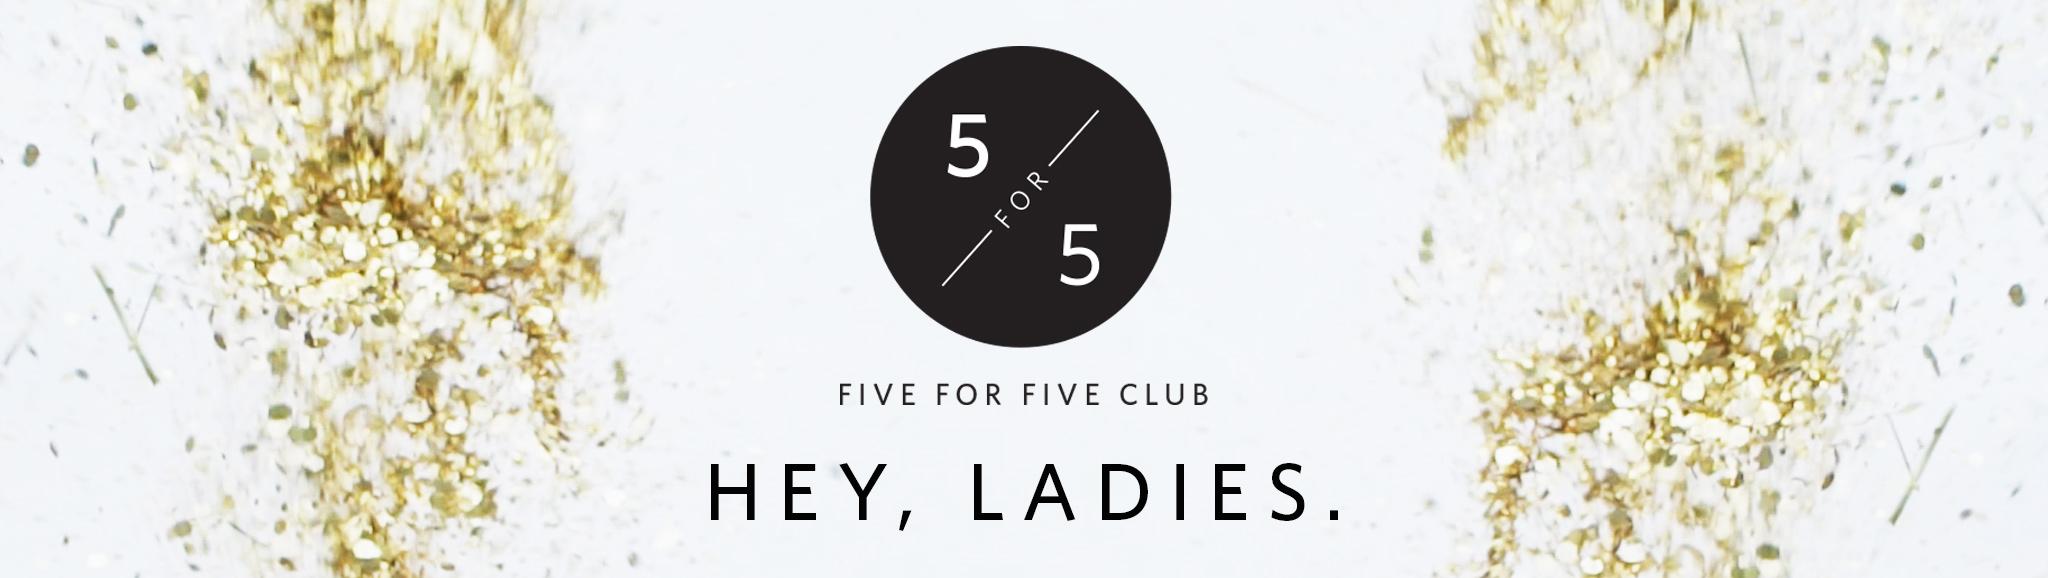 Shop Women's 5 for 5 shoes - Nisolo